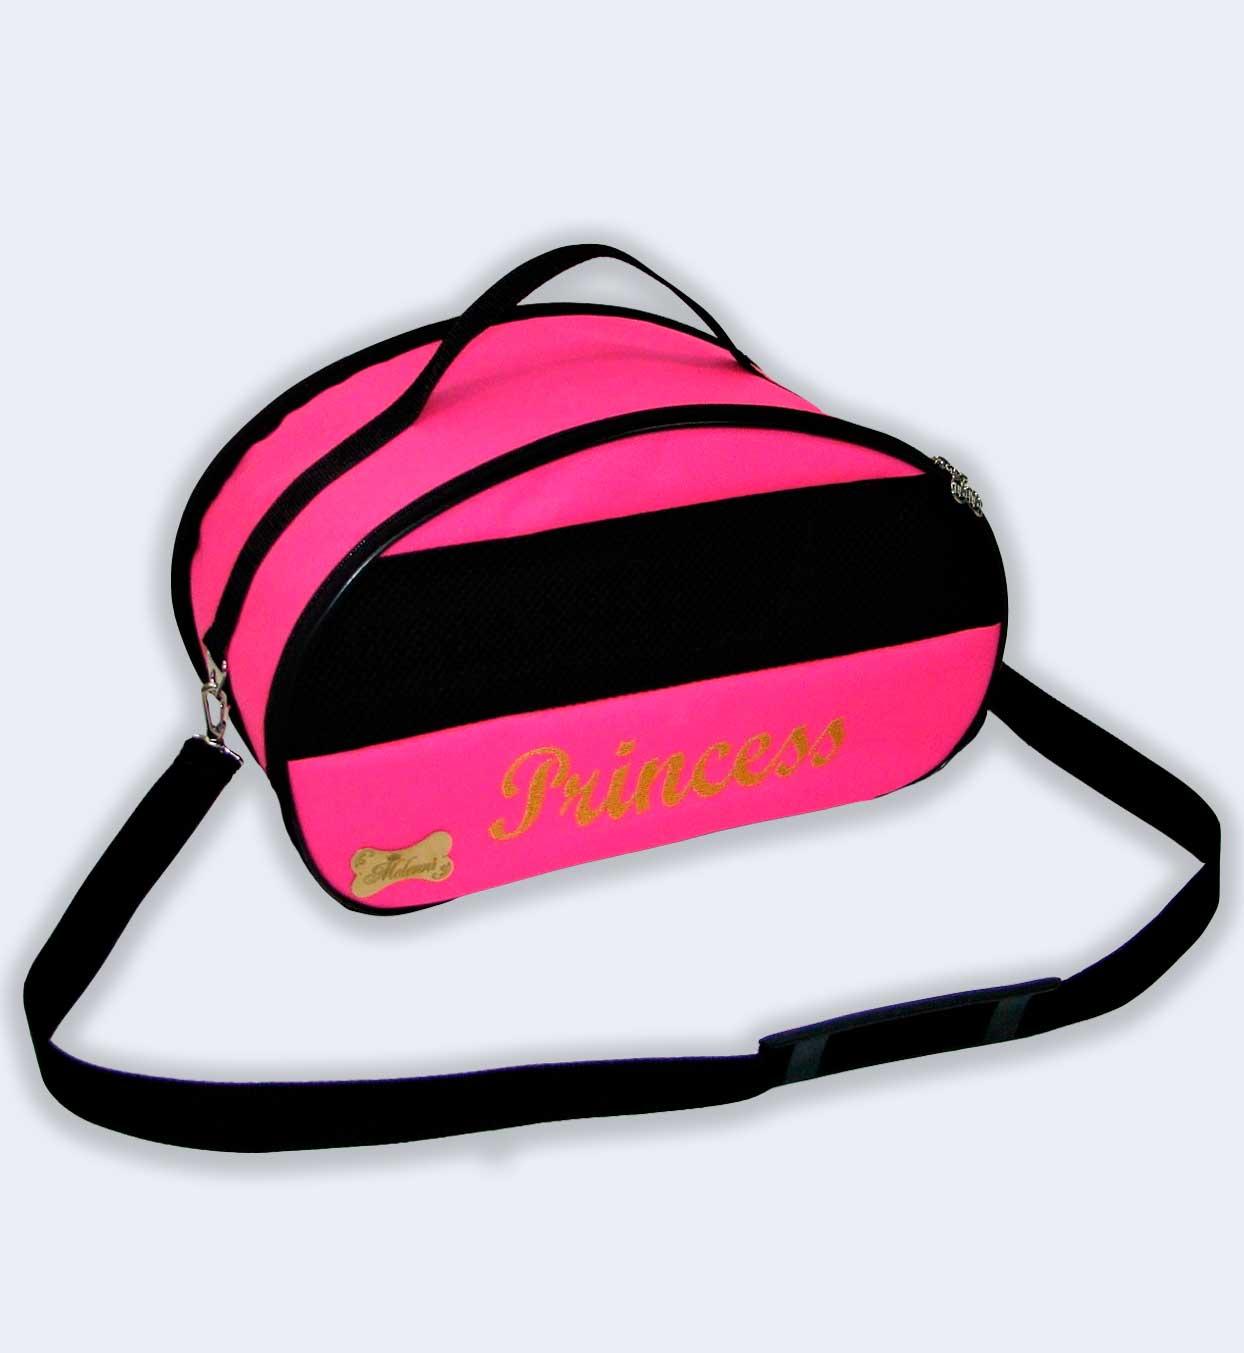 Переноска закрытая Melenni Стандарт Princess S розовая переноска для кошек и собак up флоренция розовая 46х30х32см